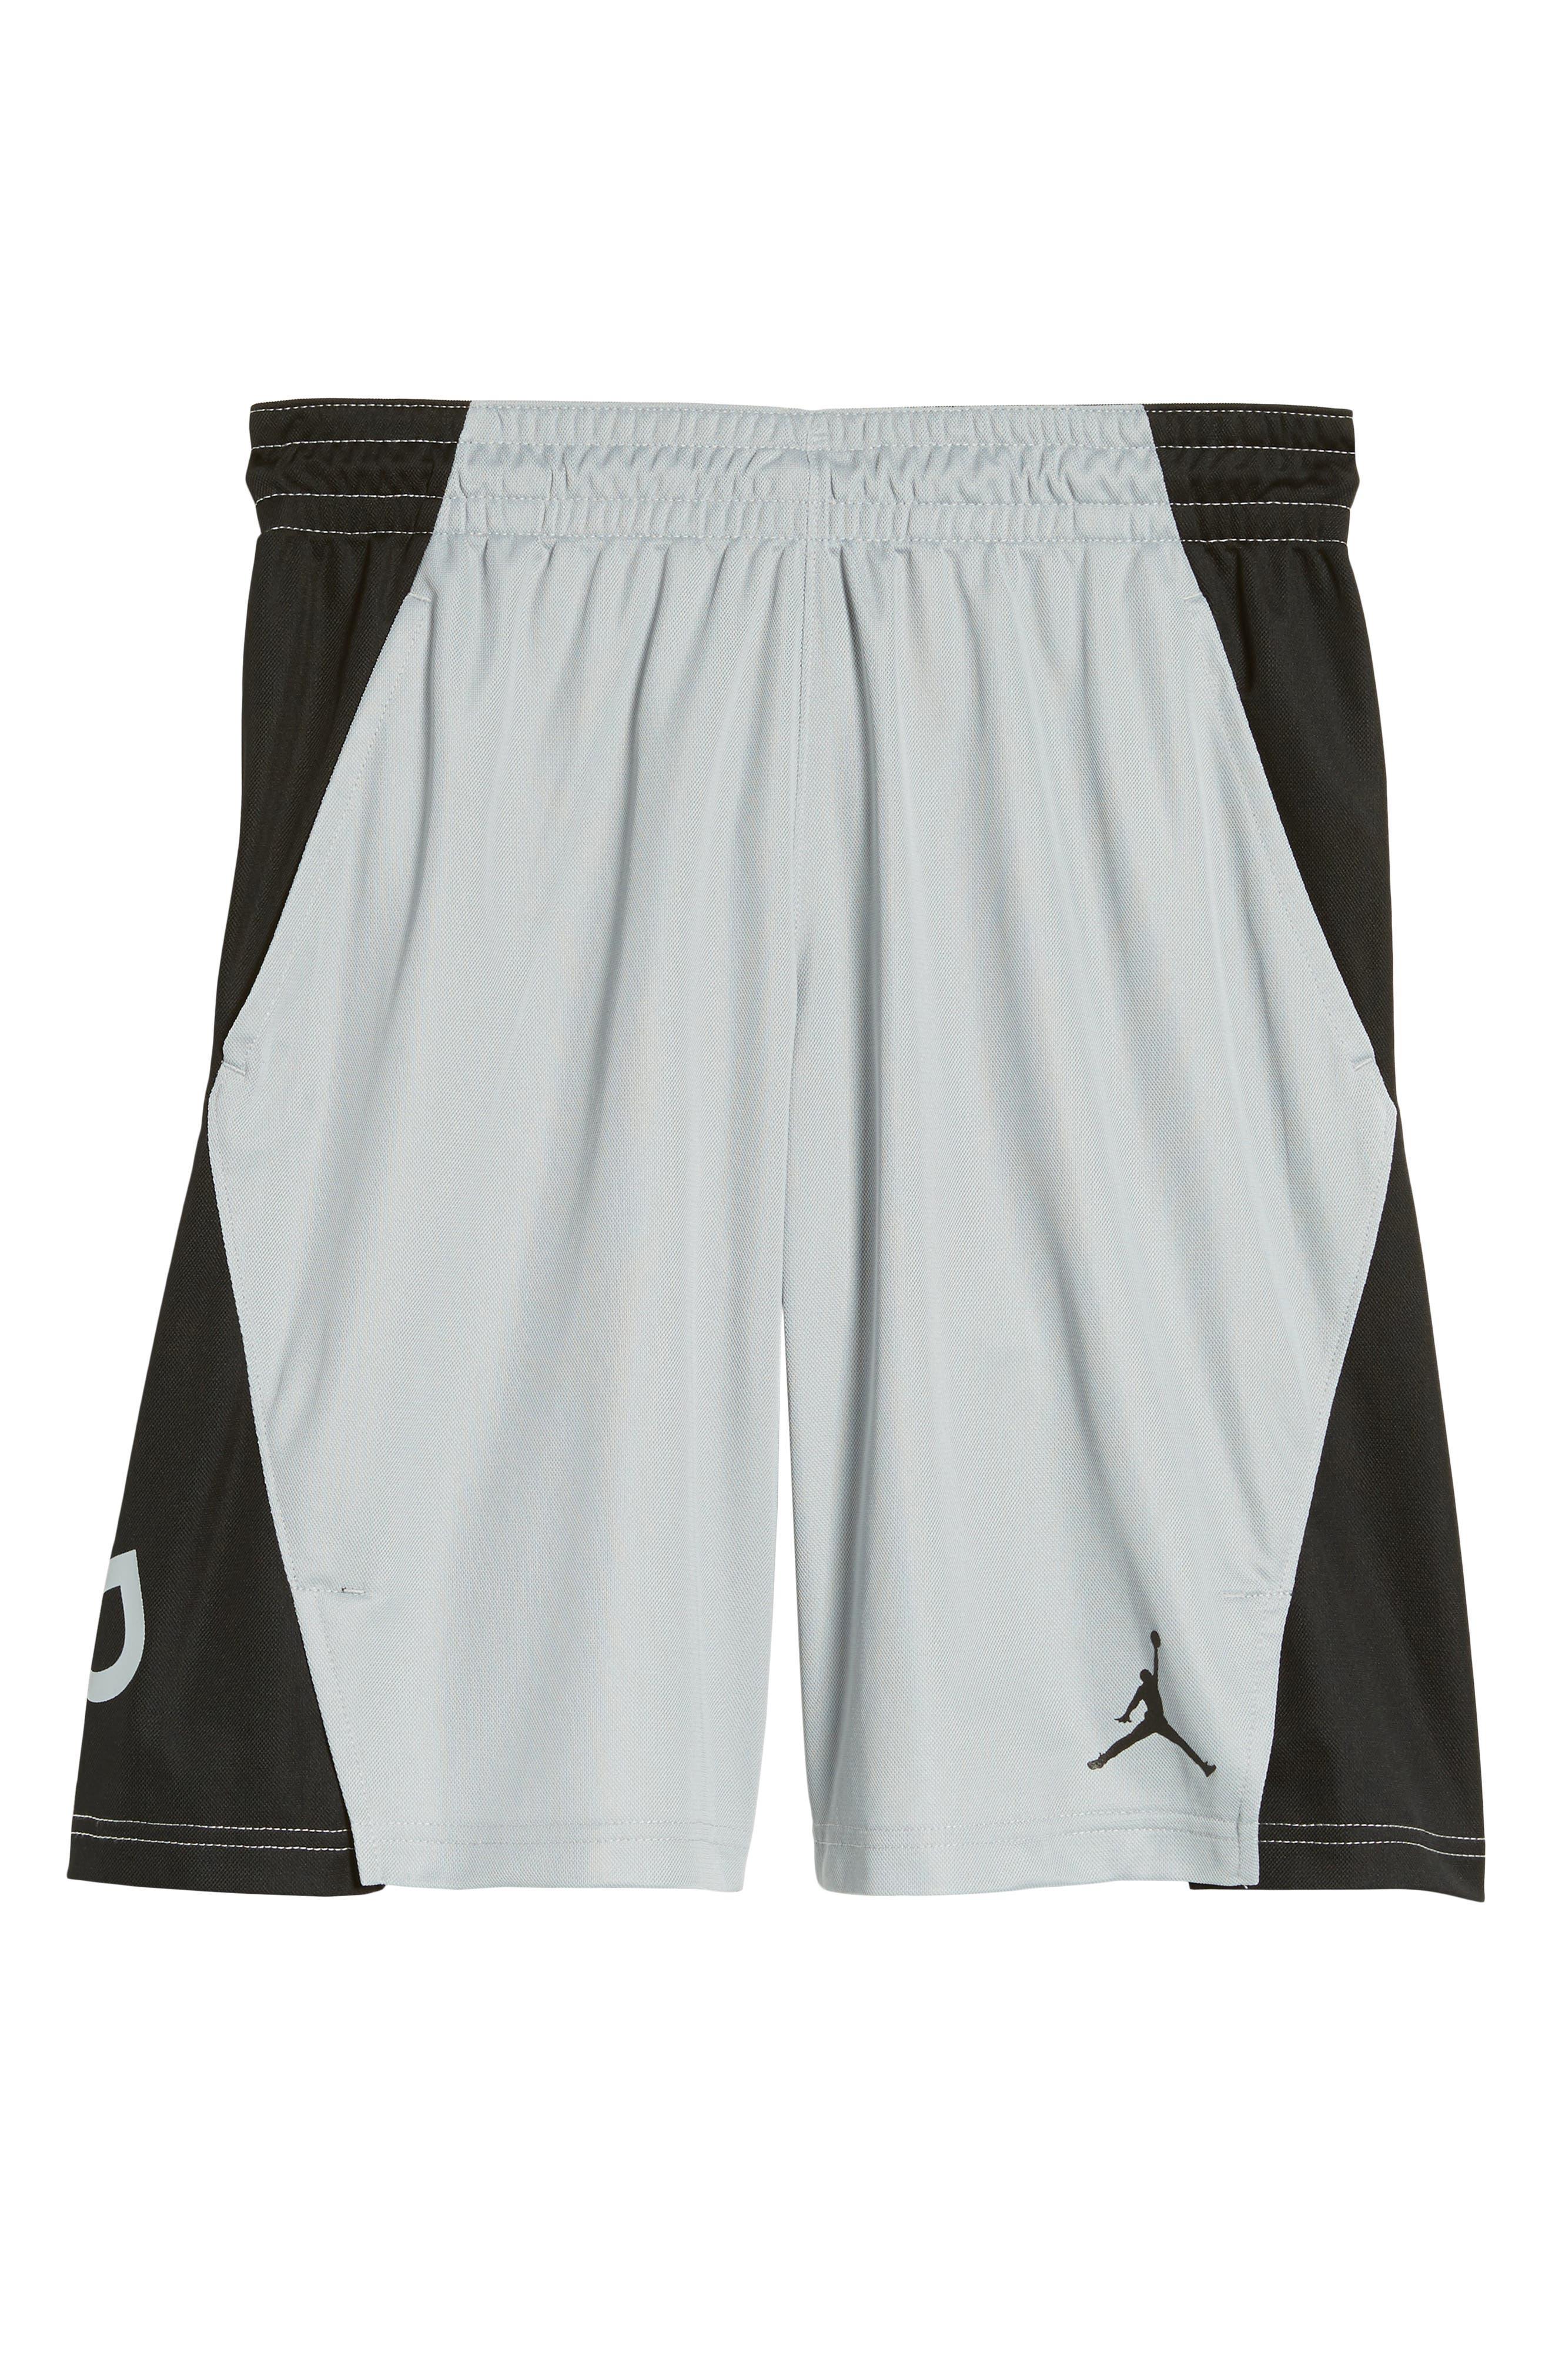 Flight Basketball Shorts,                         Main,                         color, Wolf Grey/ Black/ Black